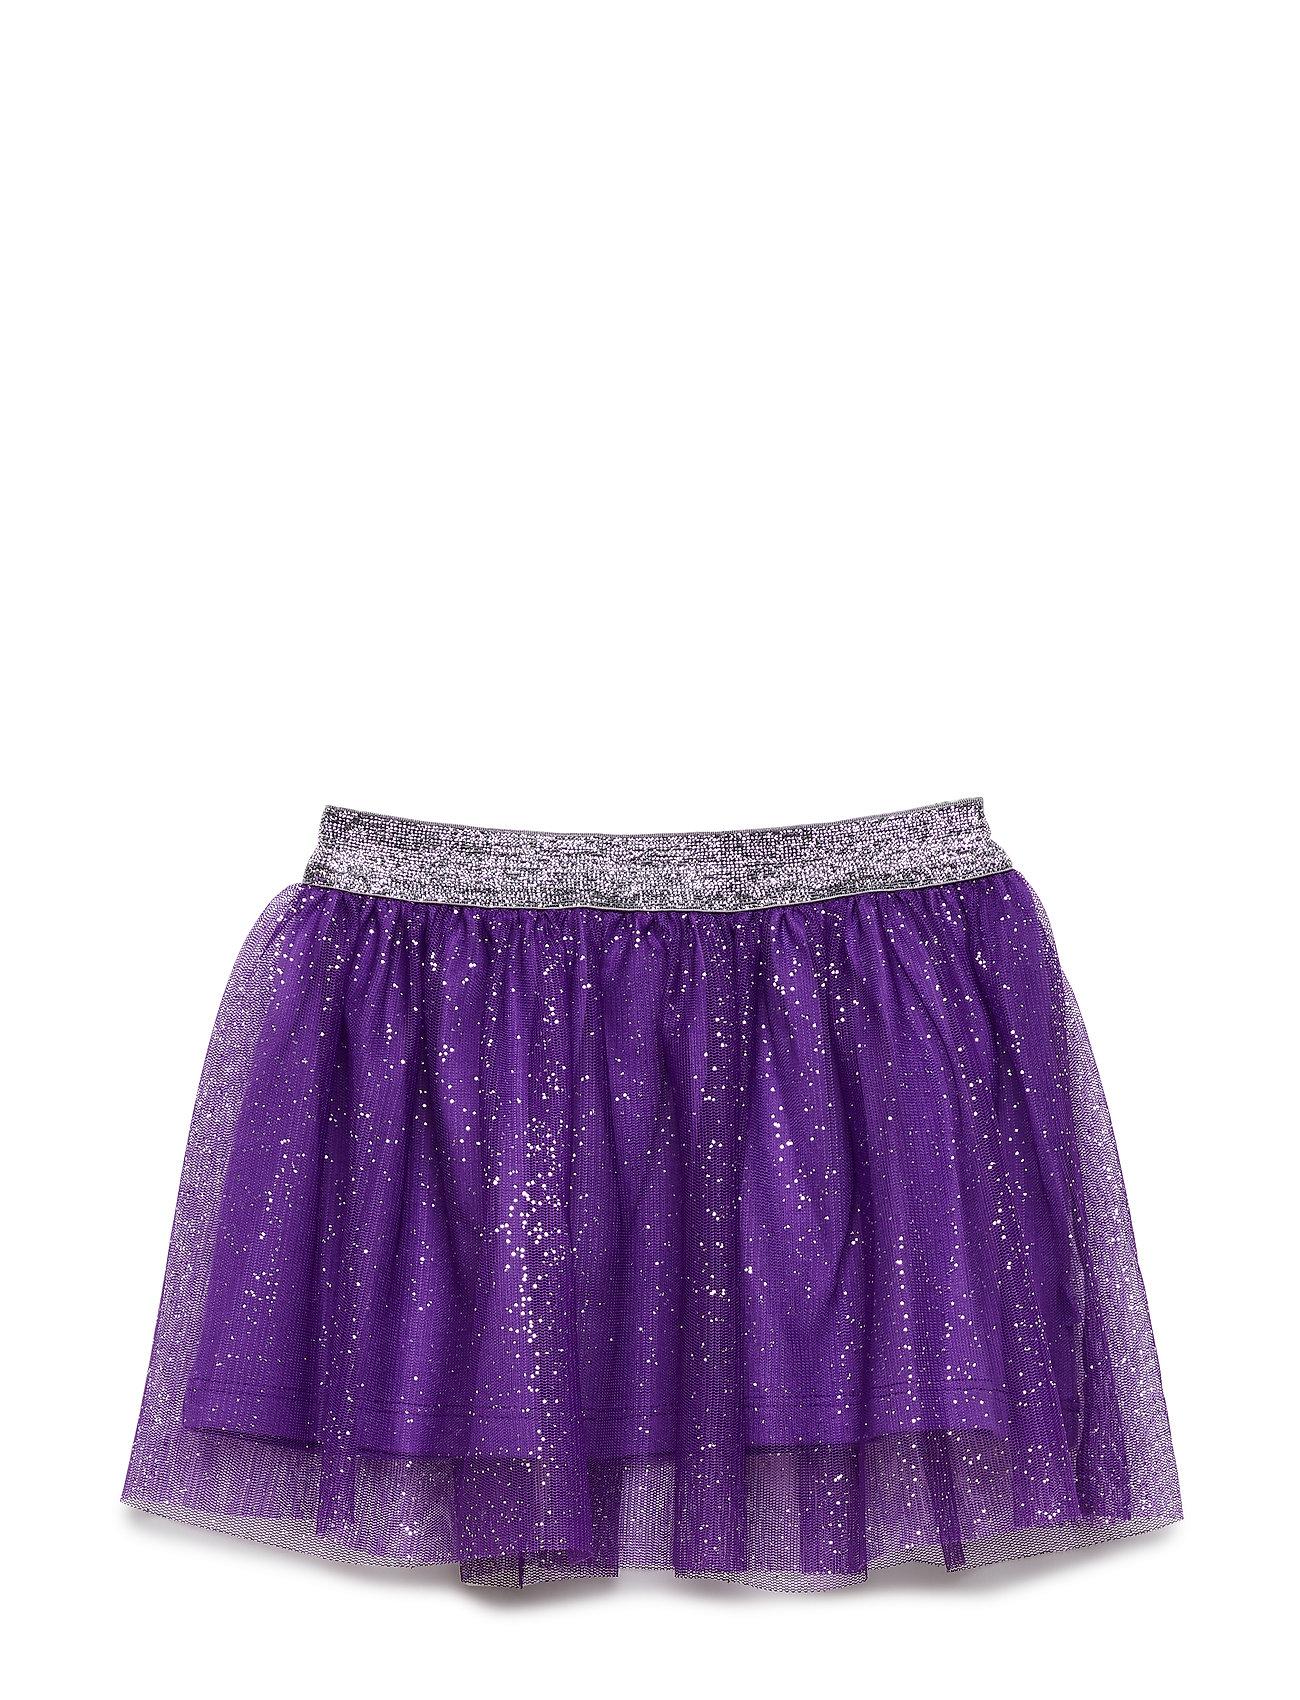 Småfolk Skirt. Tulle. Solid - PURPLE HEART